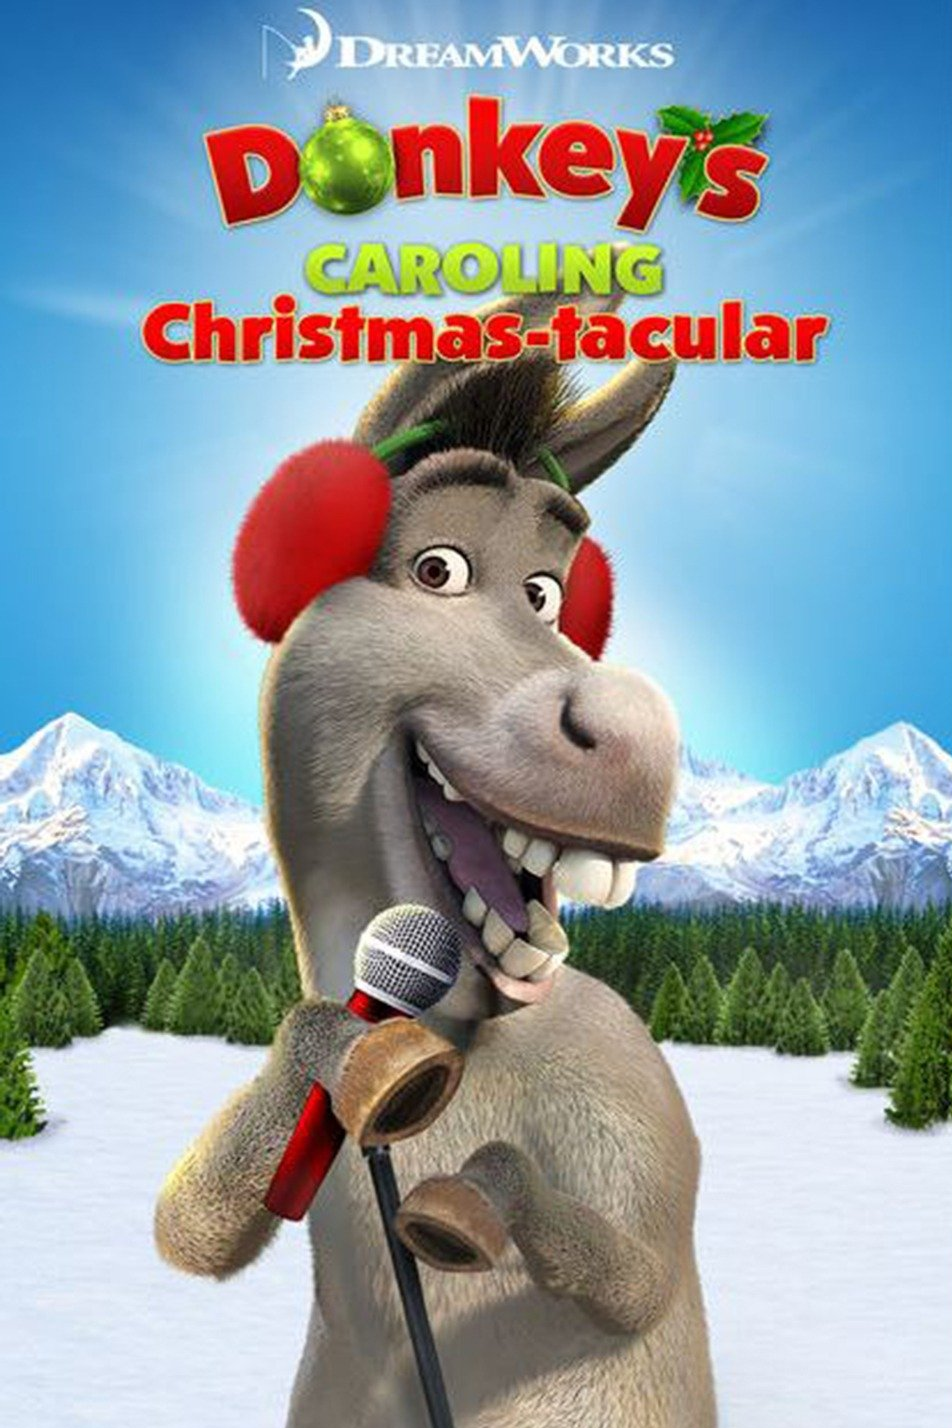 Oslíkovy Vánoce /Donkey's Christmas Shrektacular (2010)